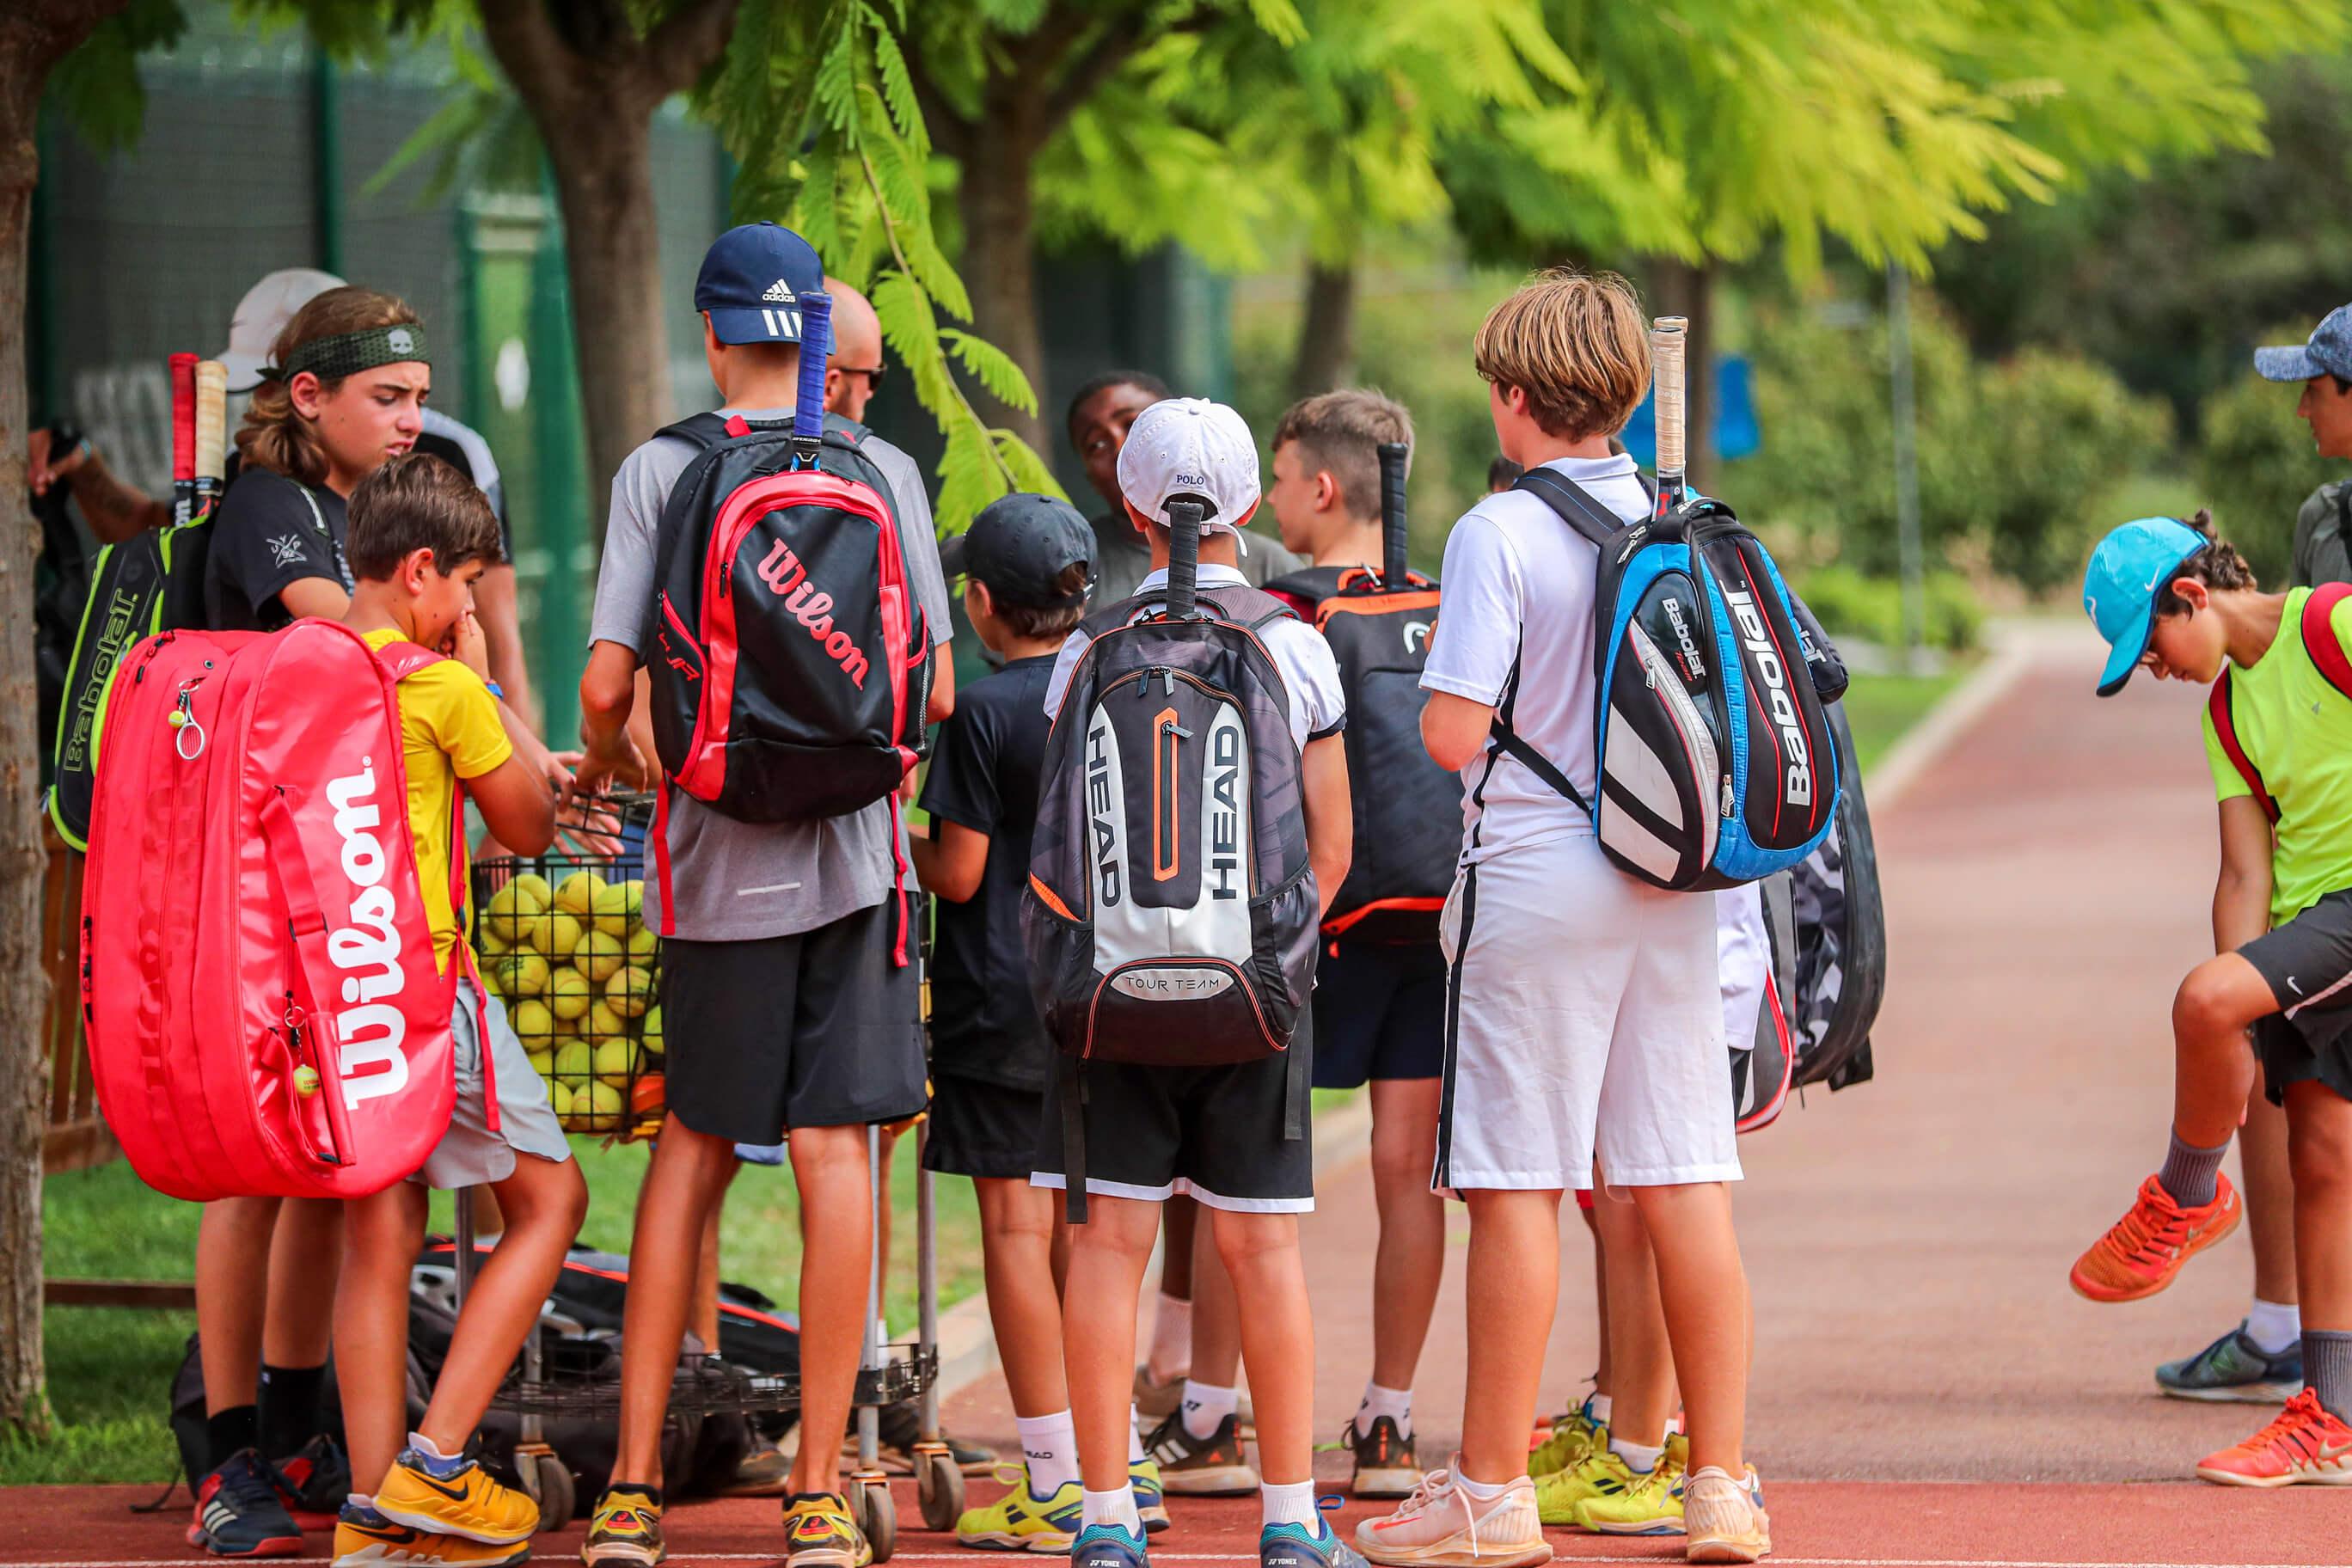 groupe tennis enfants ados